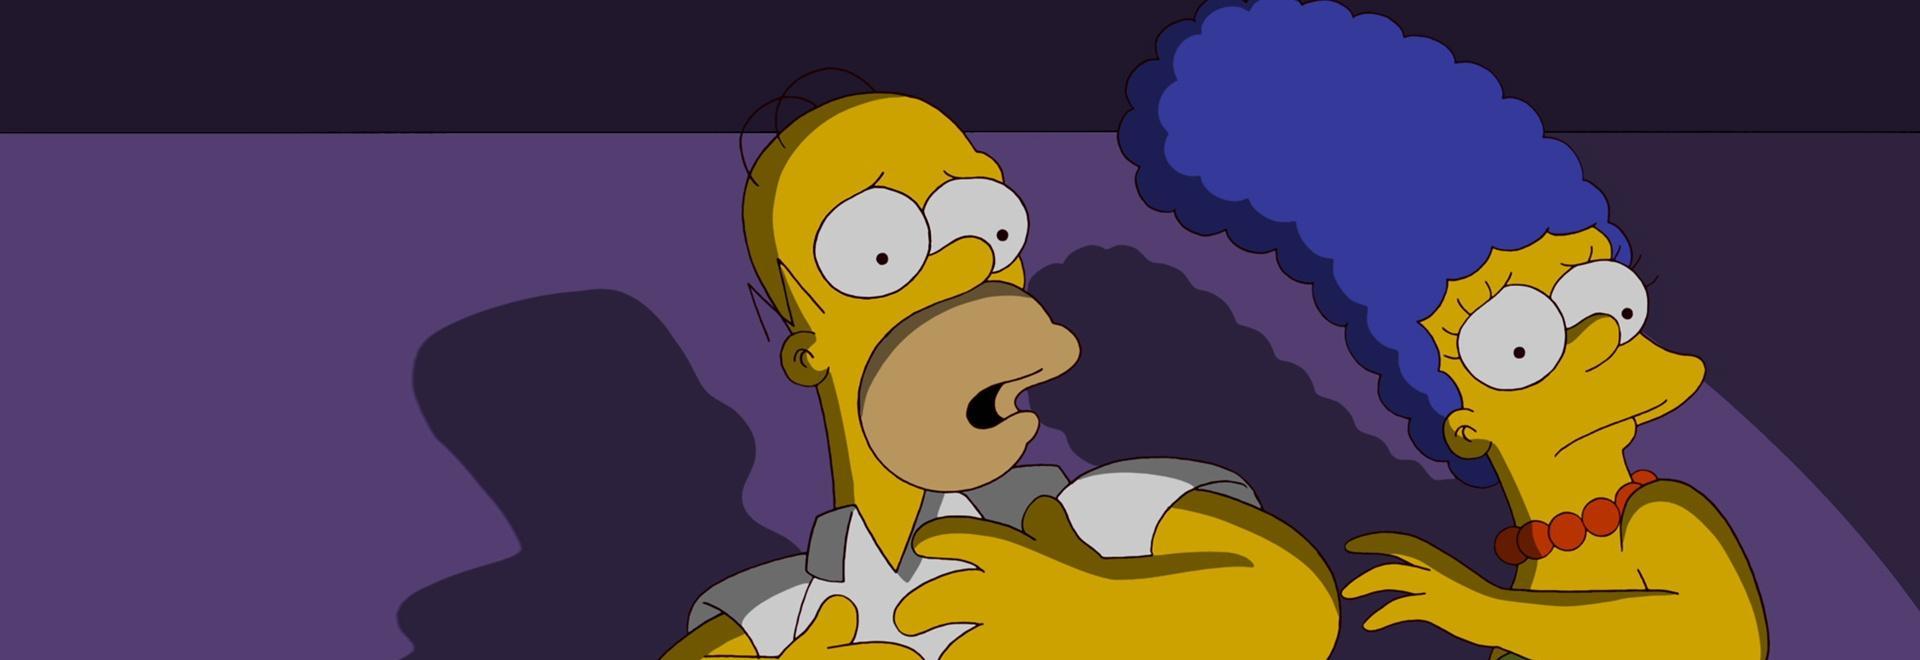 Attento mio Bart ingannatore